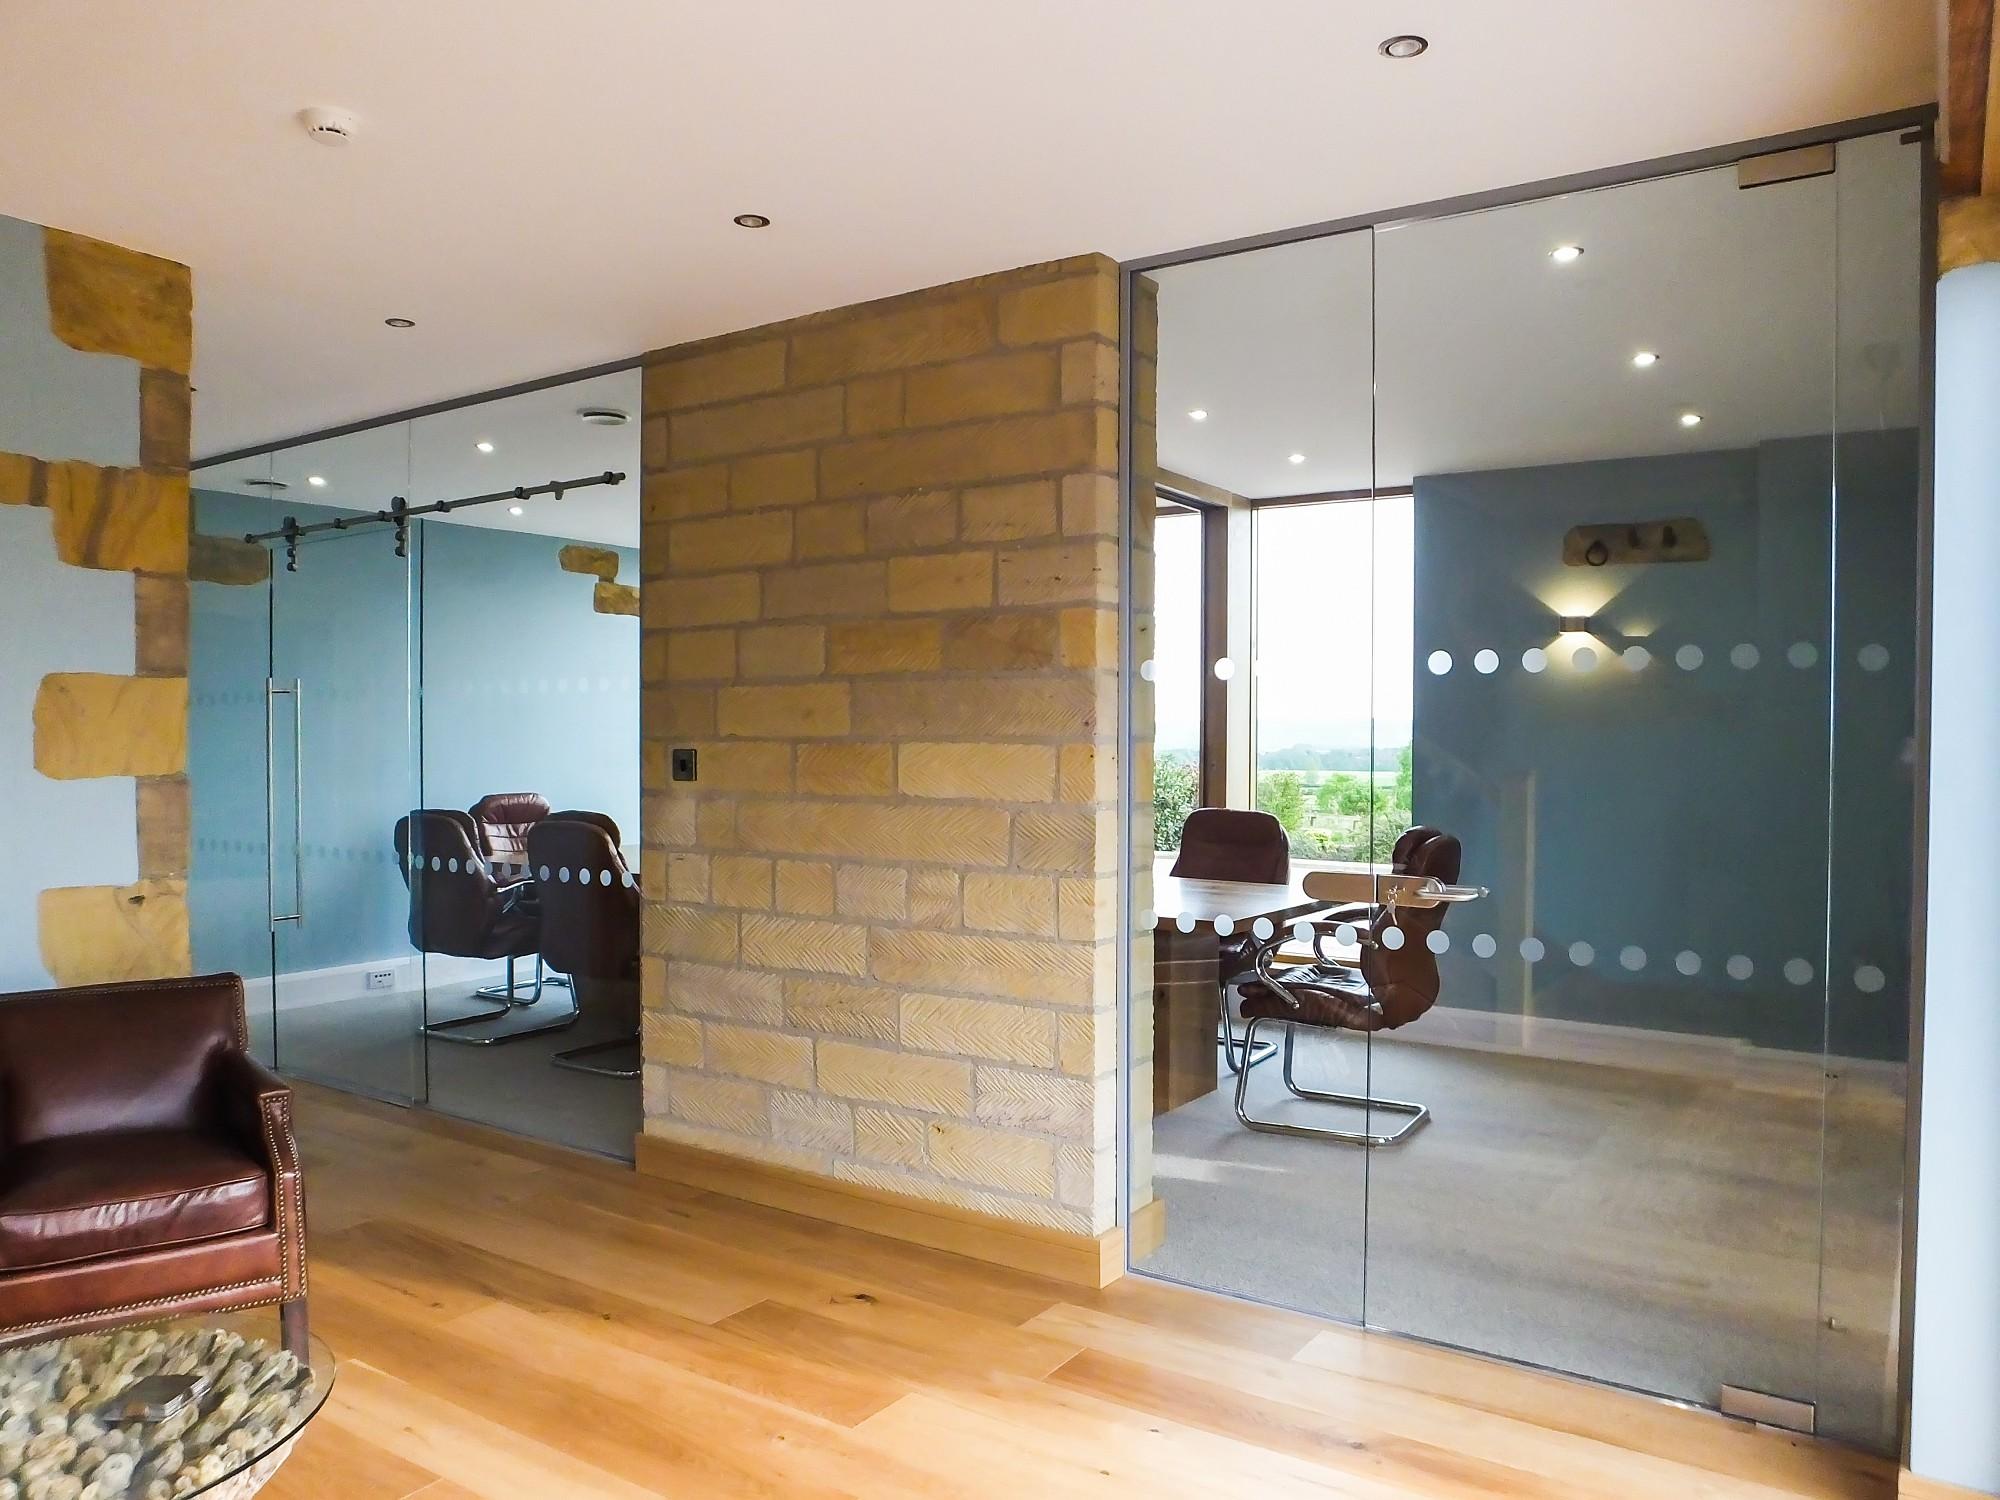 High-spec refurbishment in Wakefield using full-wall graphics